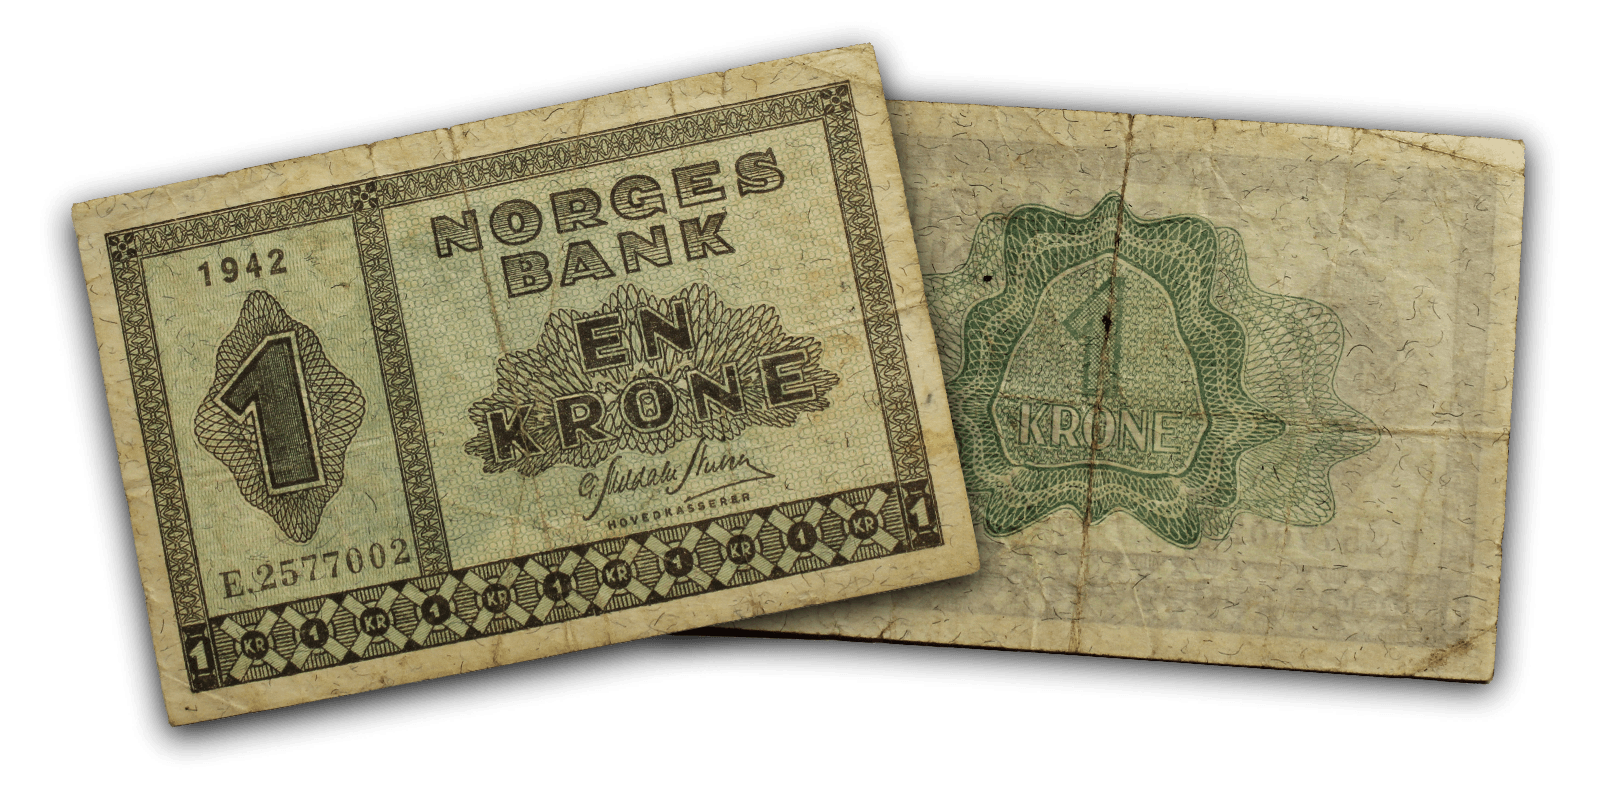 Historisk norsk seddel fra krigen